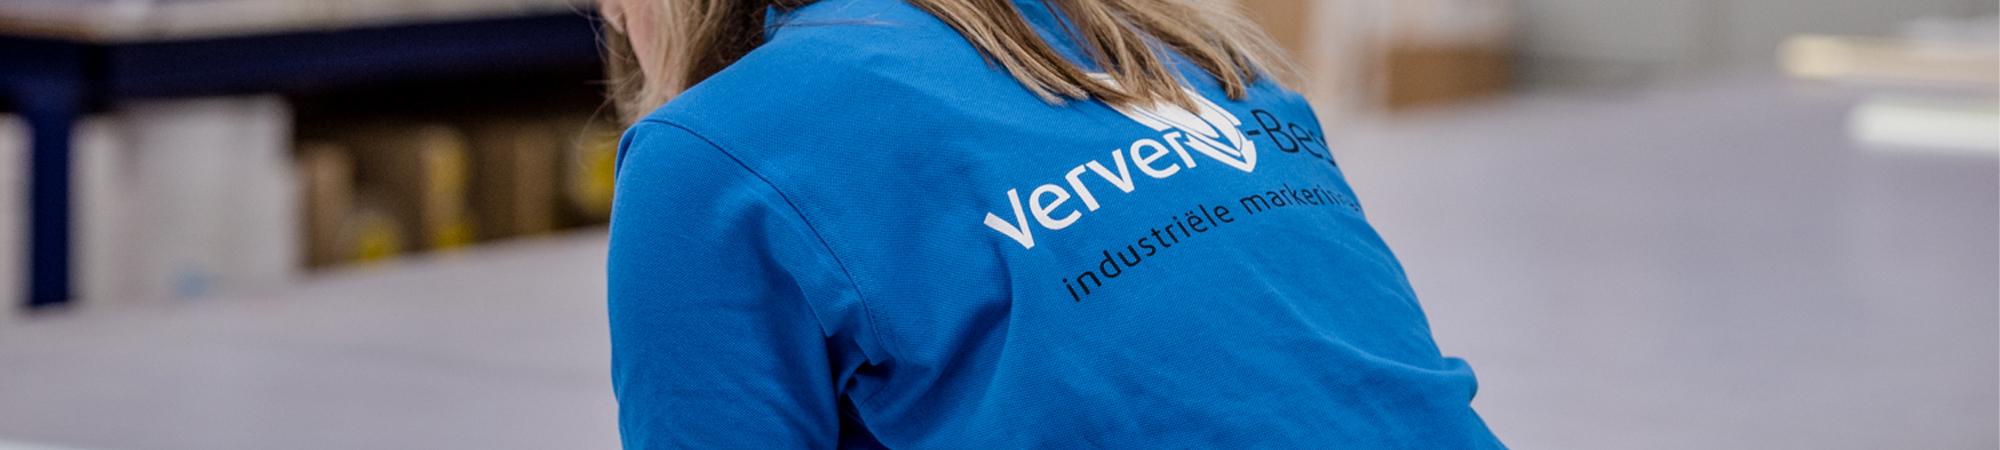 Verver-Best